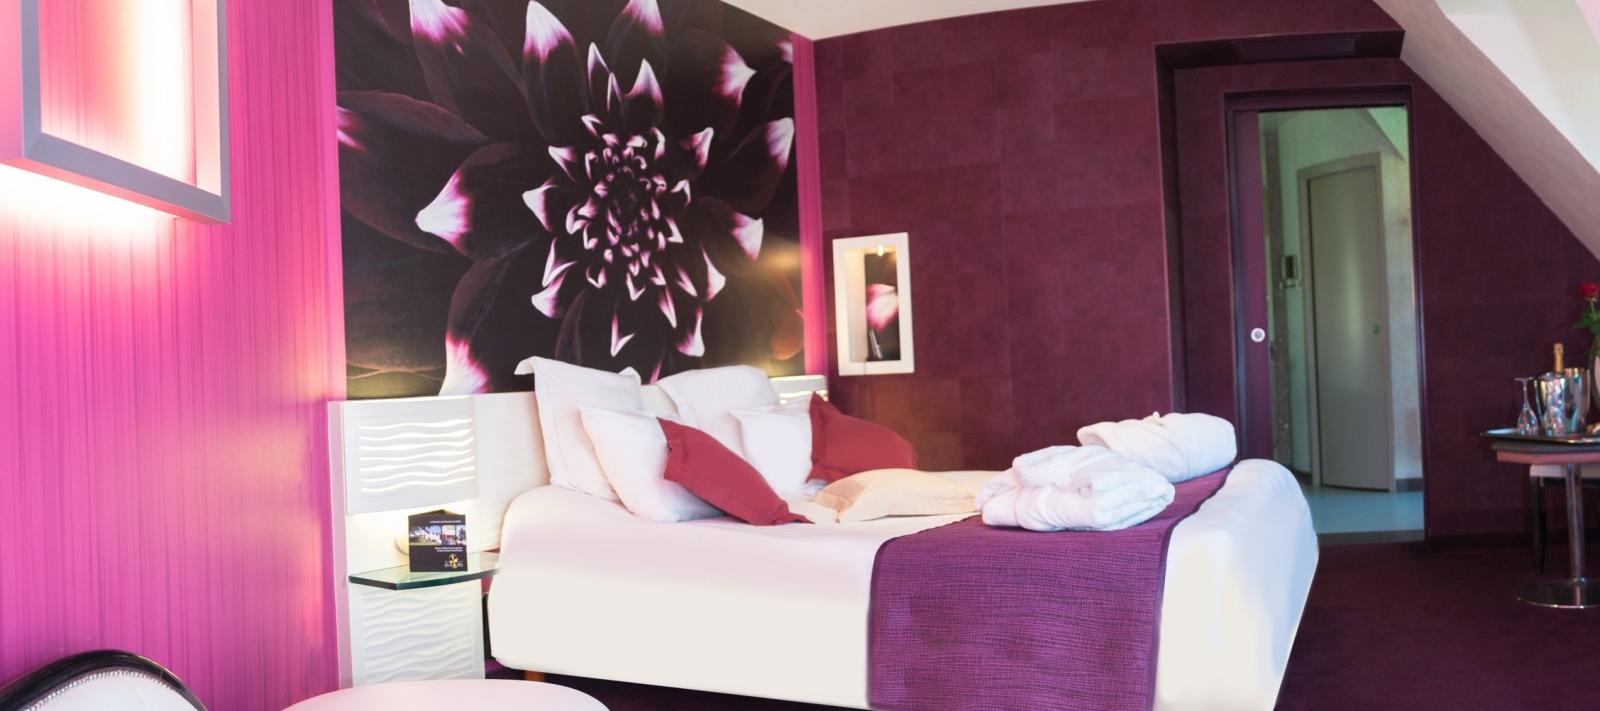 Luxury room villedieu